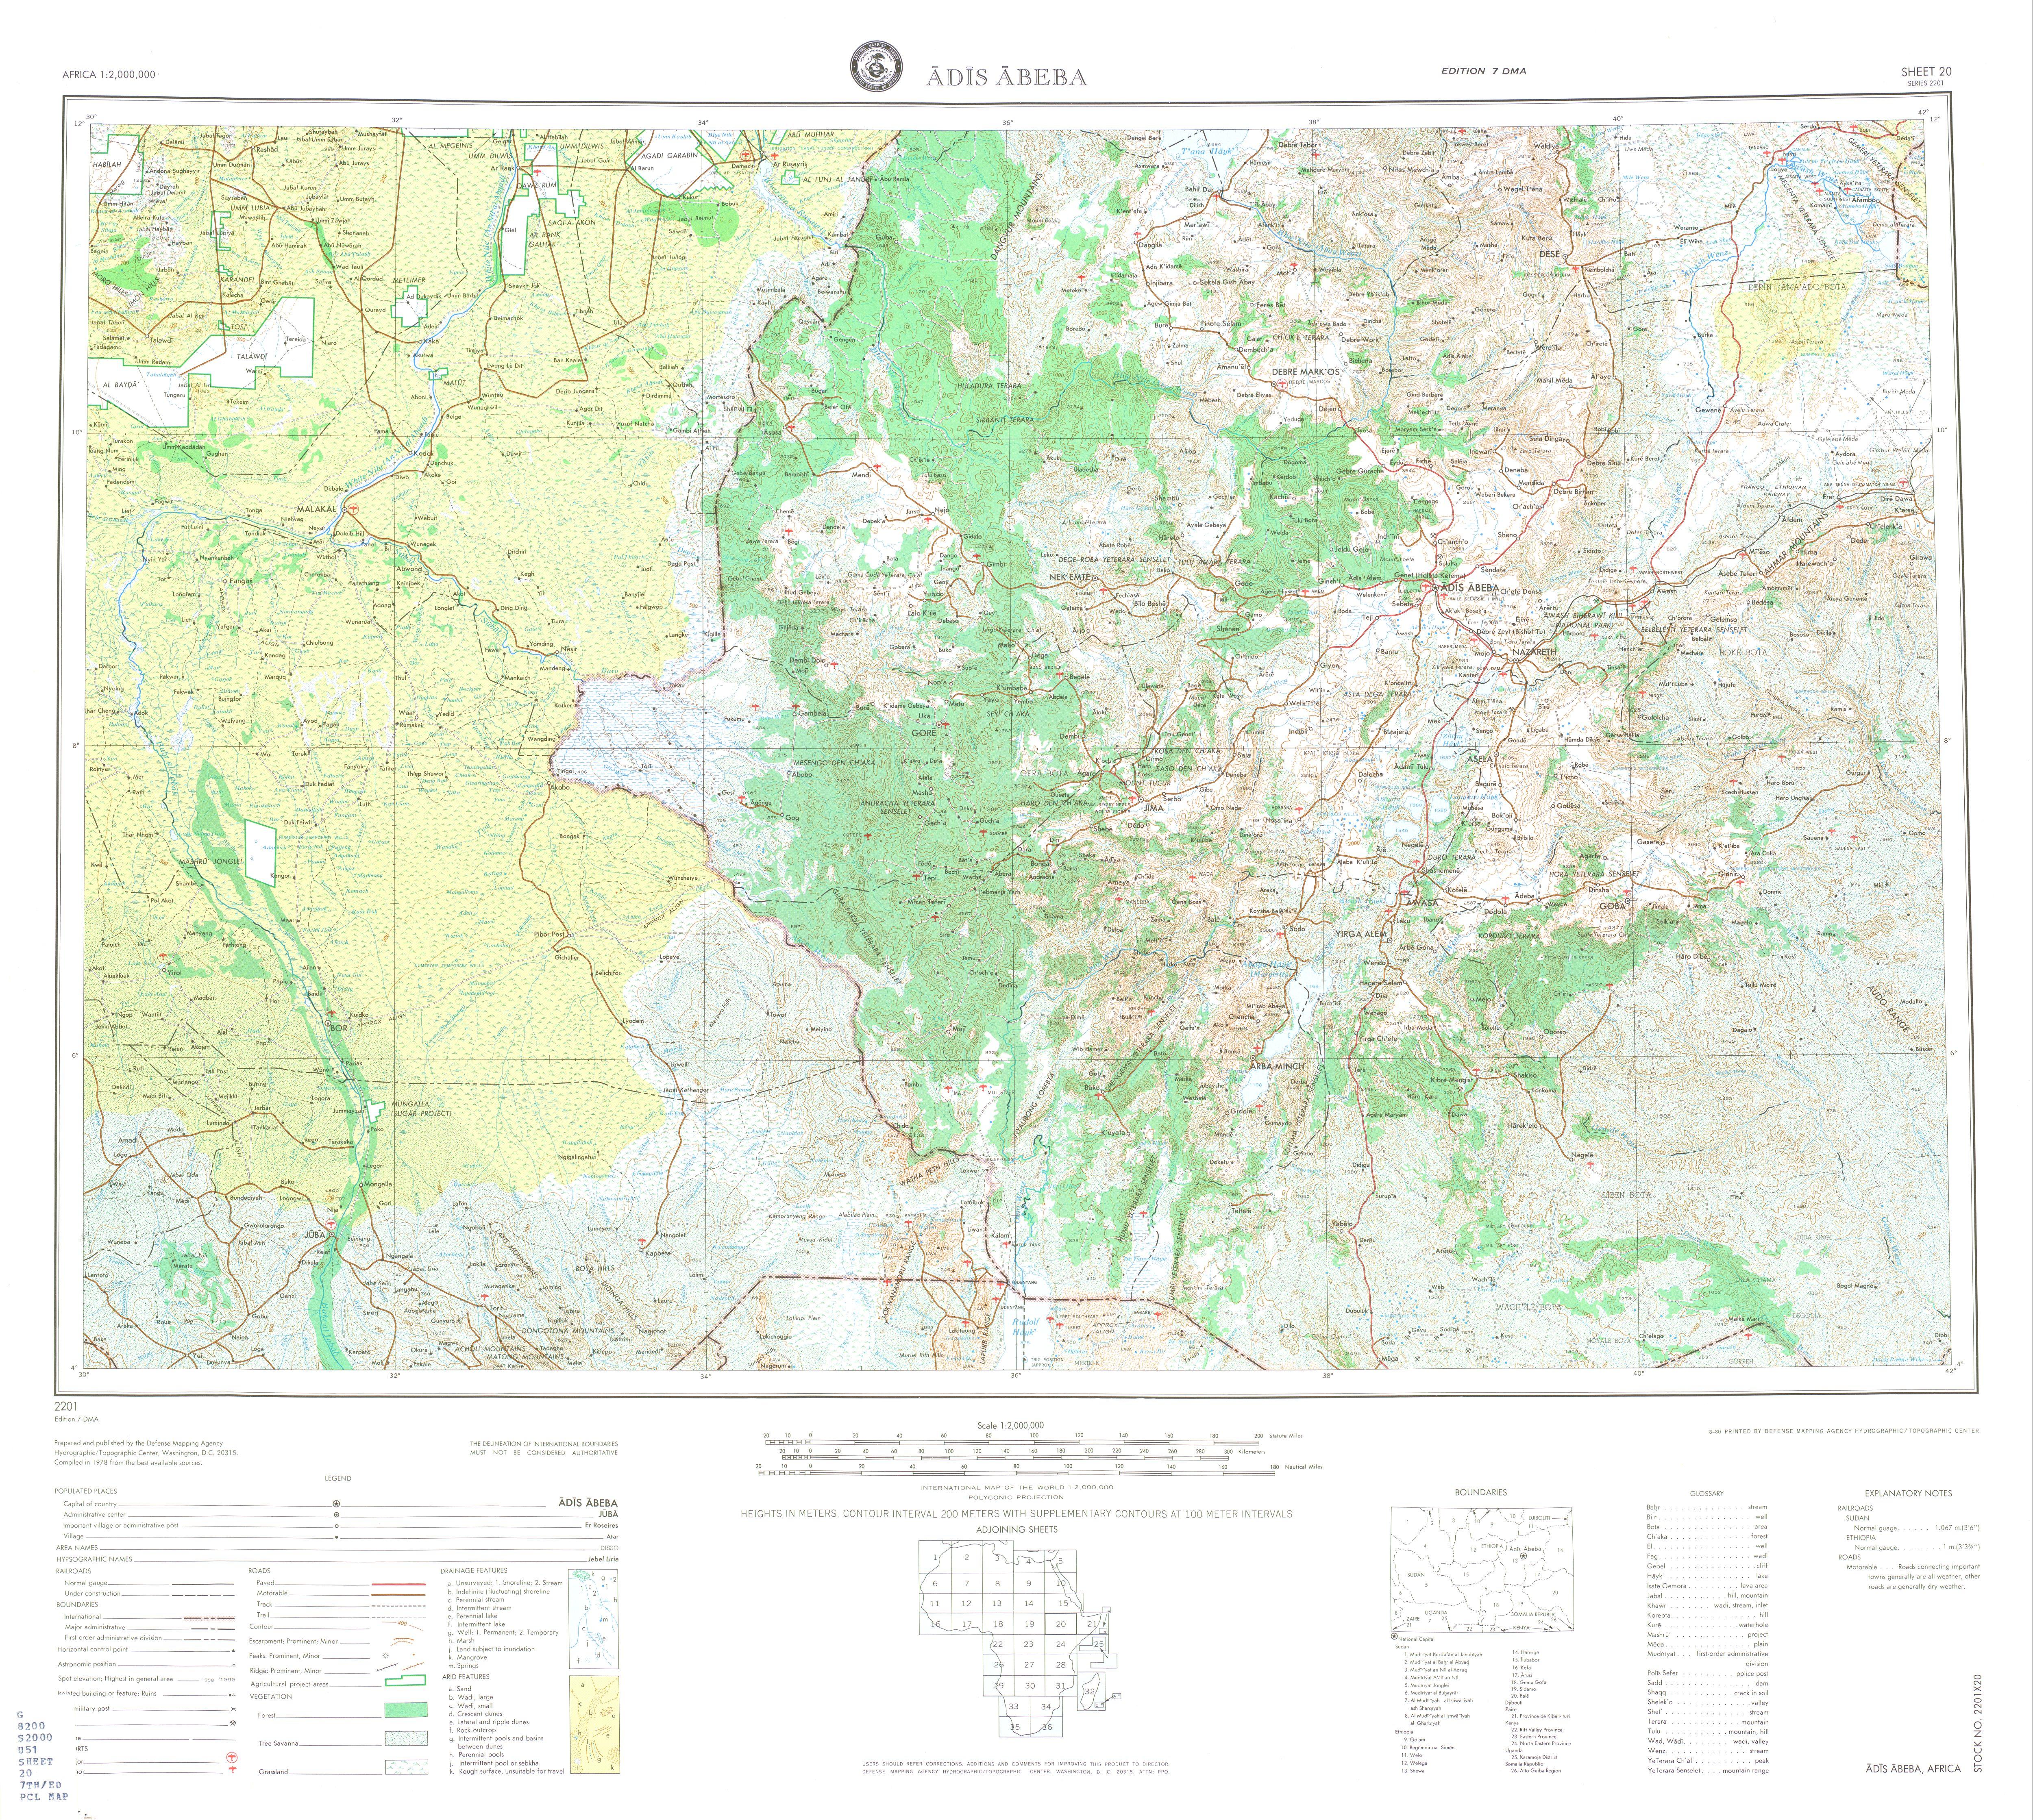 Hoja Adis Abeba (Adís Abeba) del Mapa Topográfico de África 1978